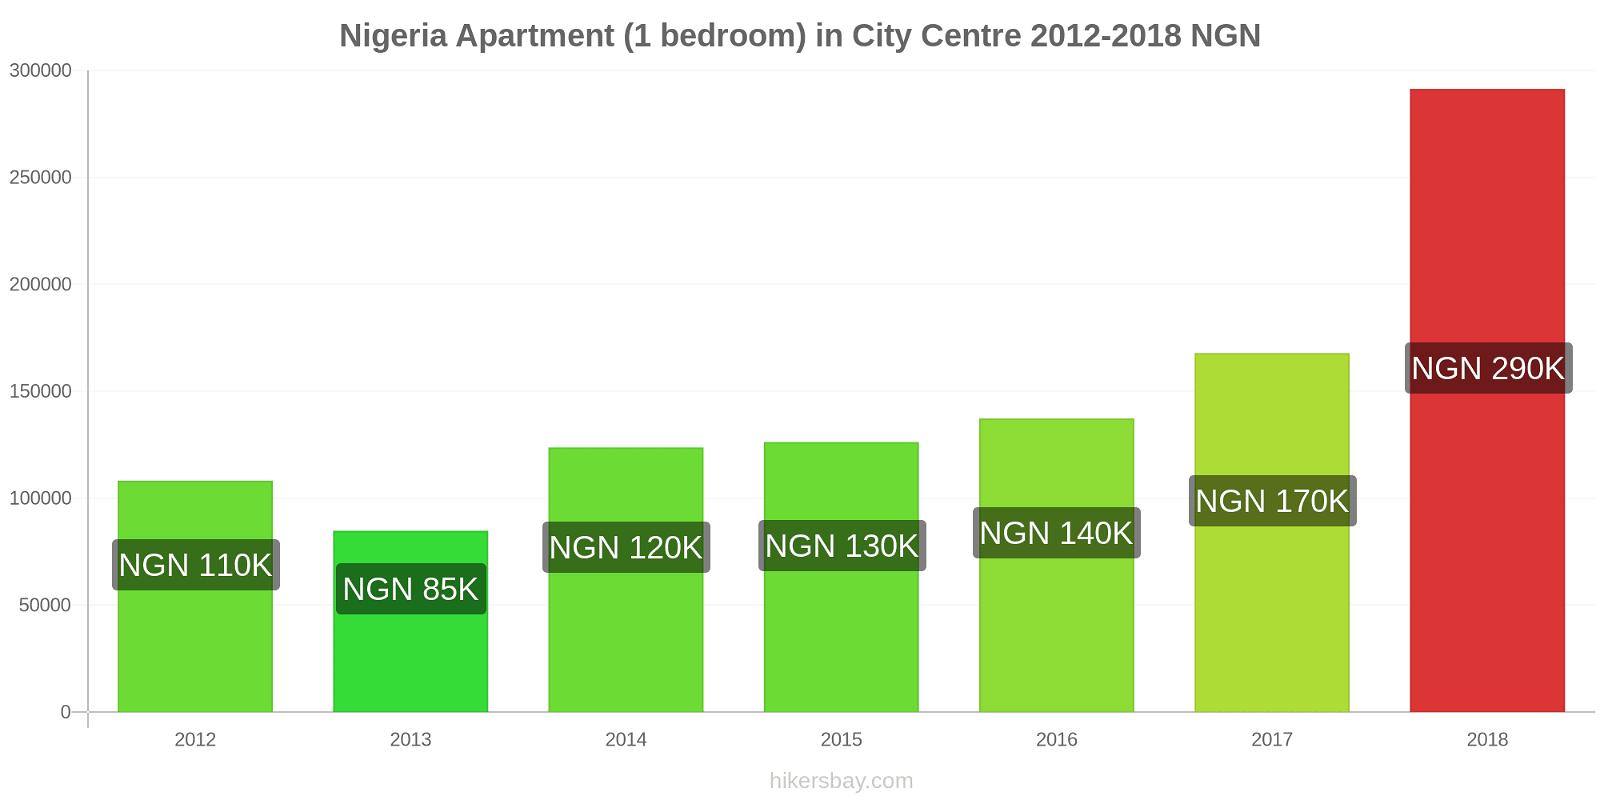 Nigeria price changes Apartment (1 bedroom) in City Centre hikersbay.com